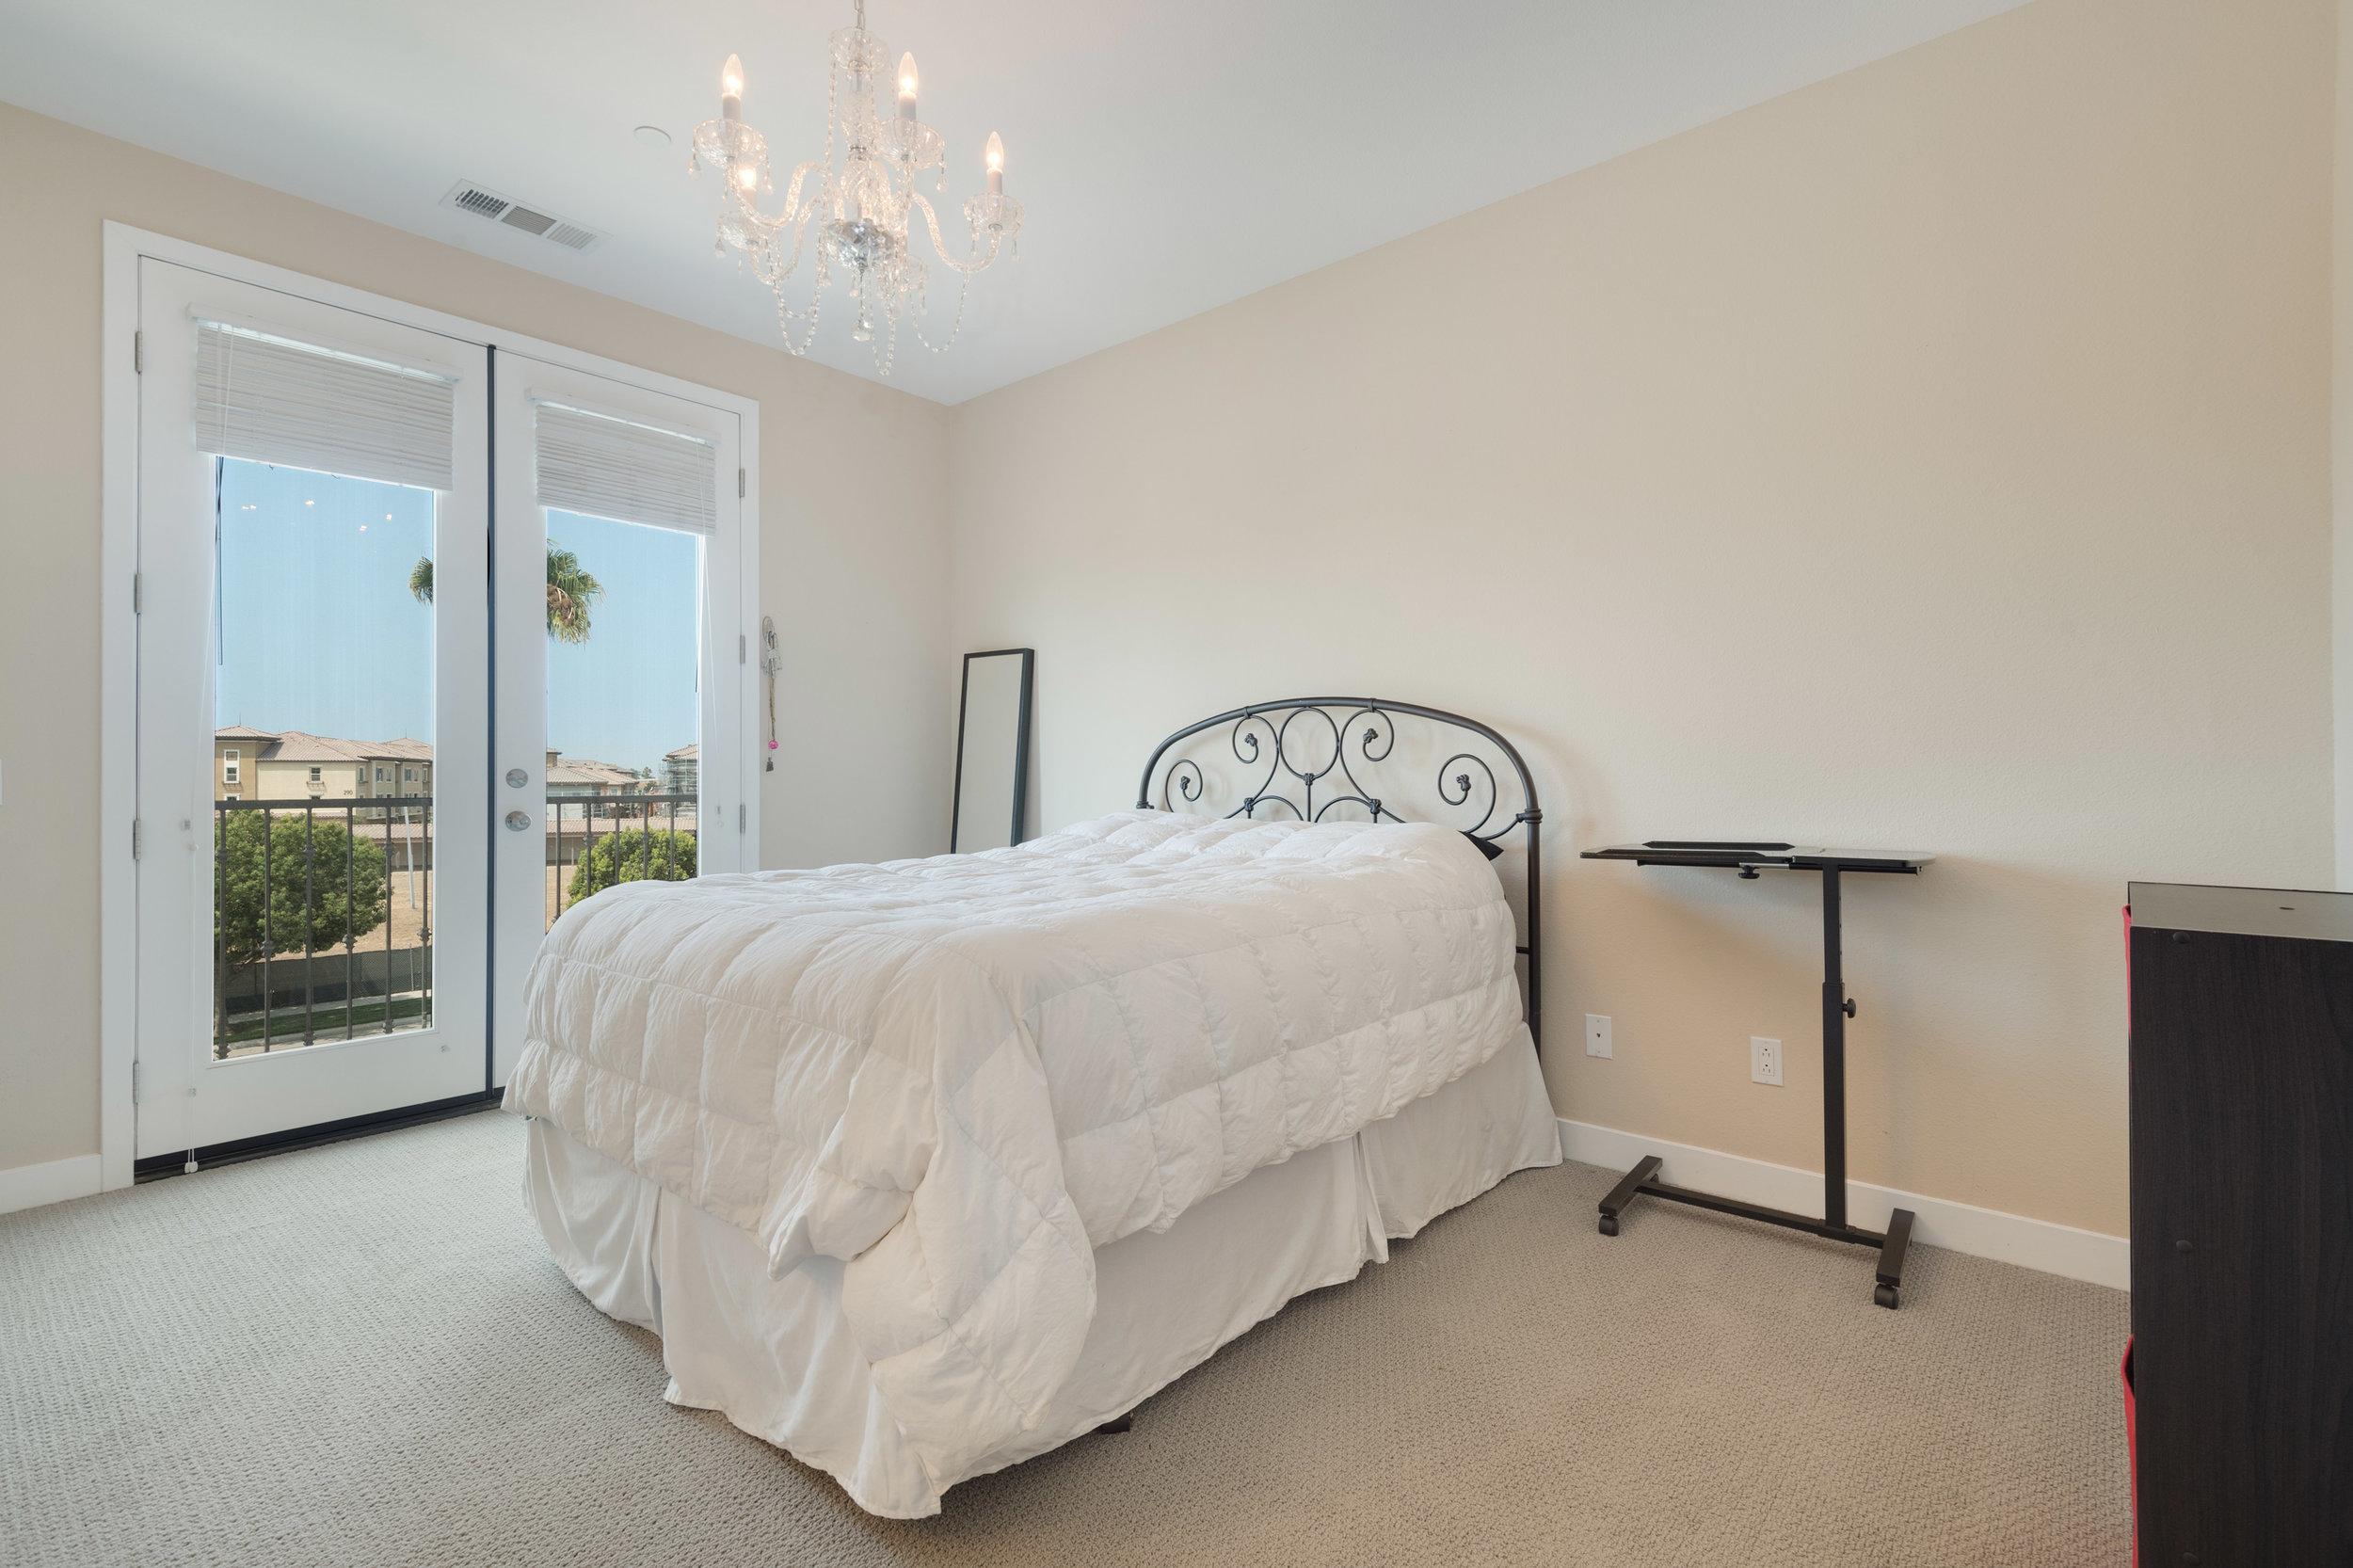 012 Master Bedroom 207 Westpark Court Unit 702 Camarillo Bally Khehra For Sale Lease The Malibu Life Team Luxury Real Estate.jpg